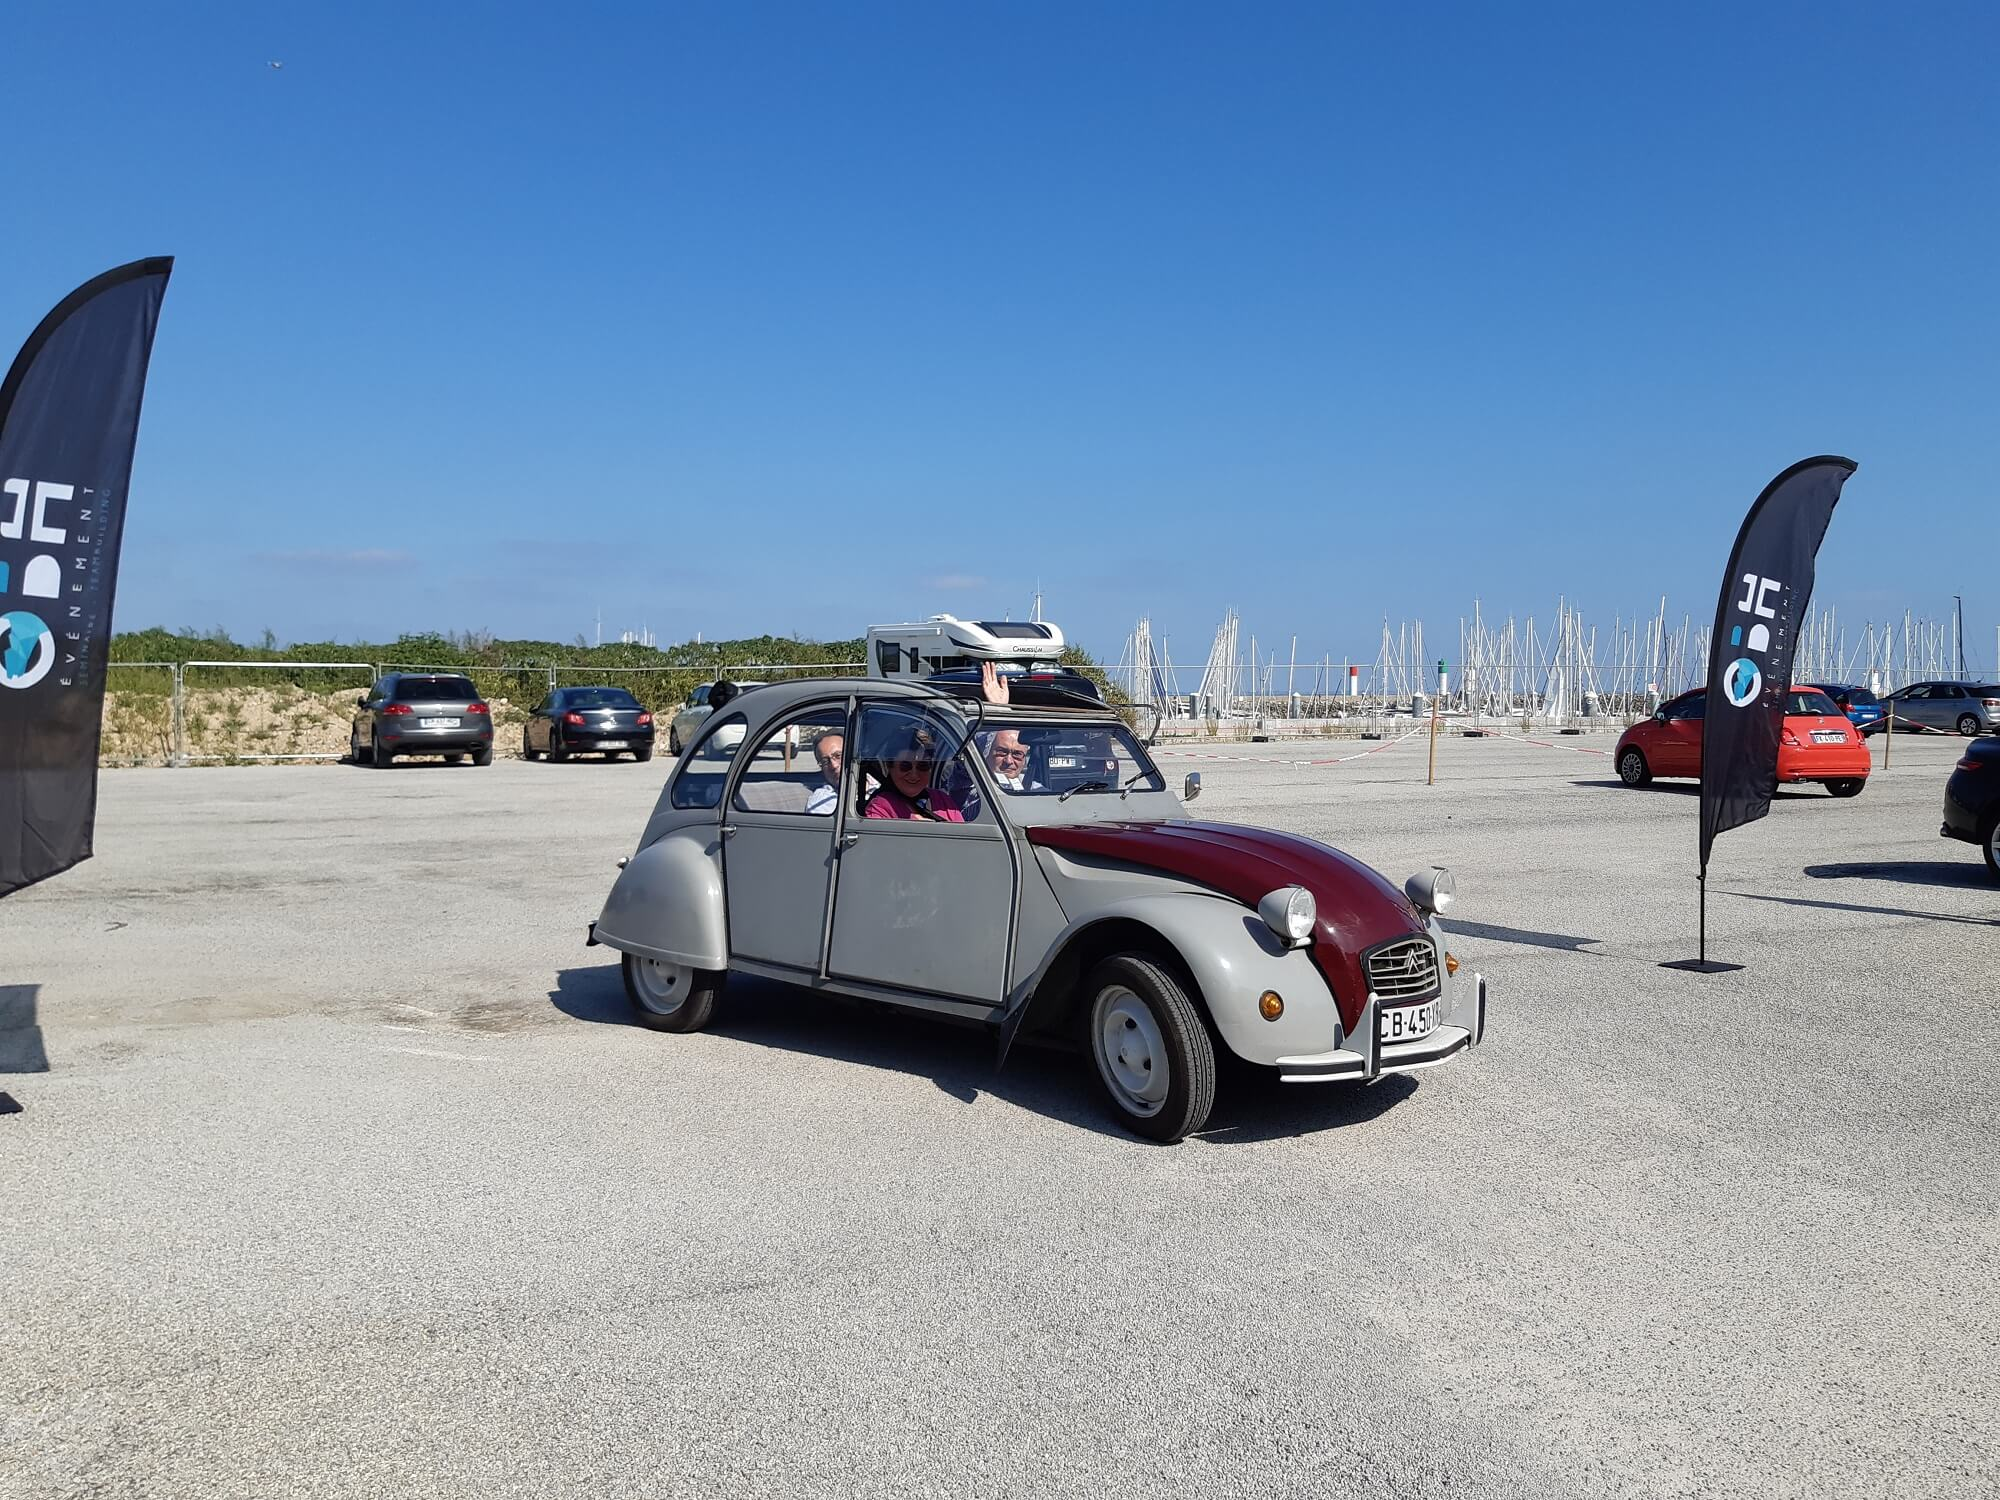 Rallye 2CV Saint-Gilles Croix de vie avec OBH EVENEMENT